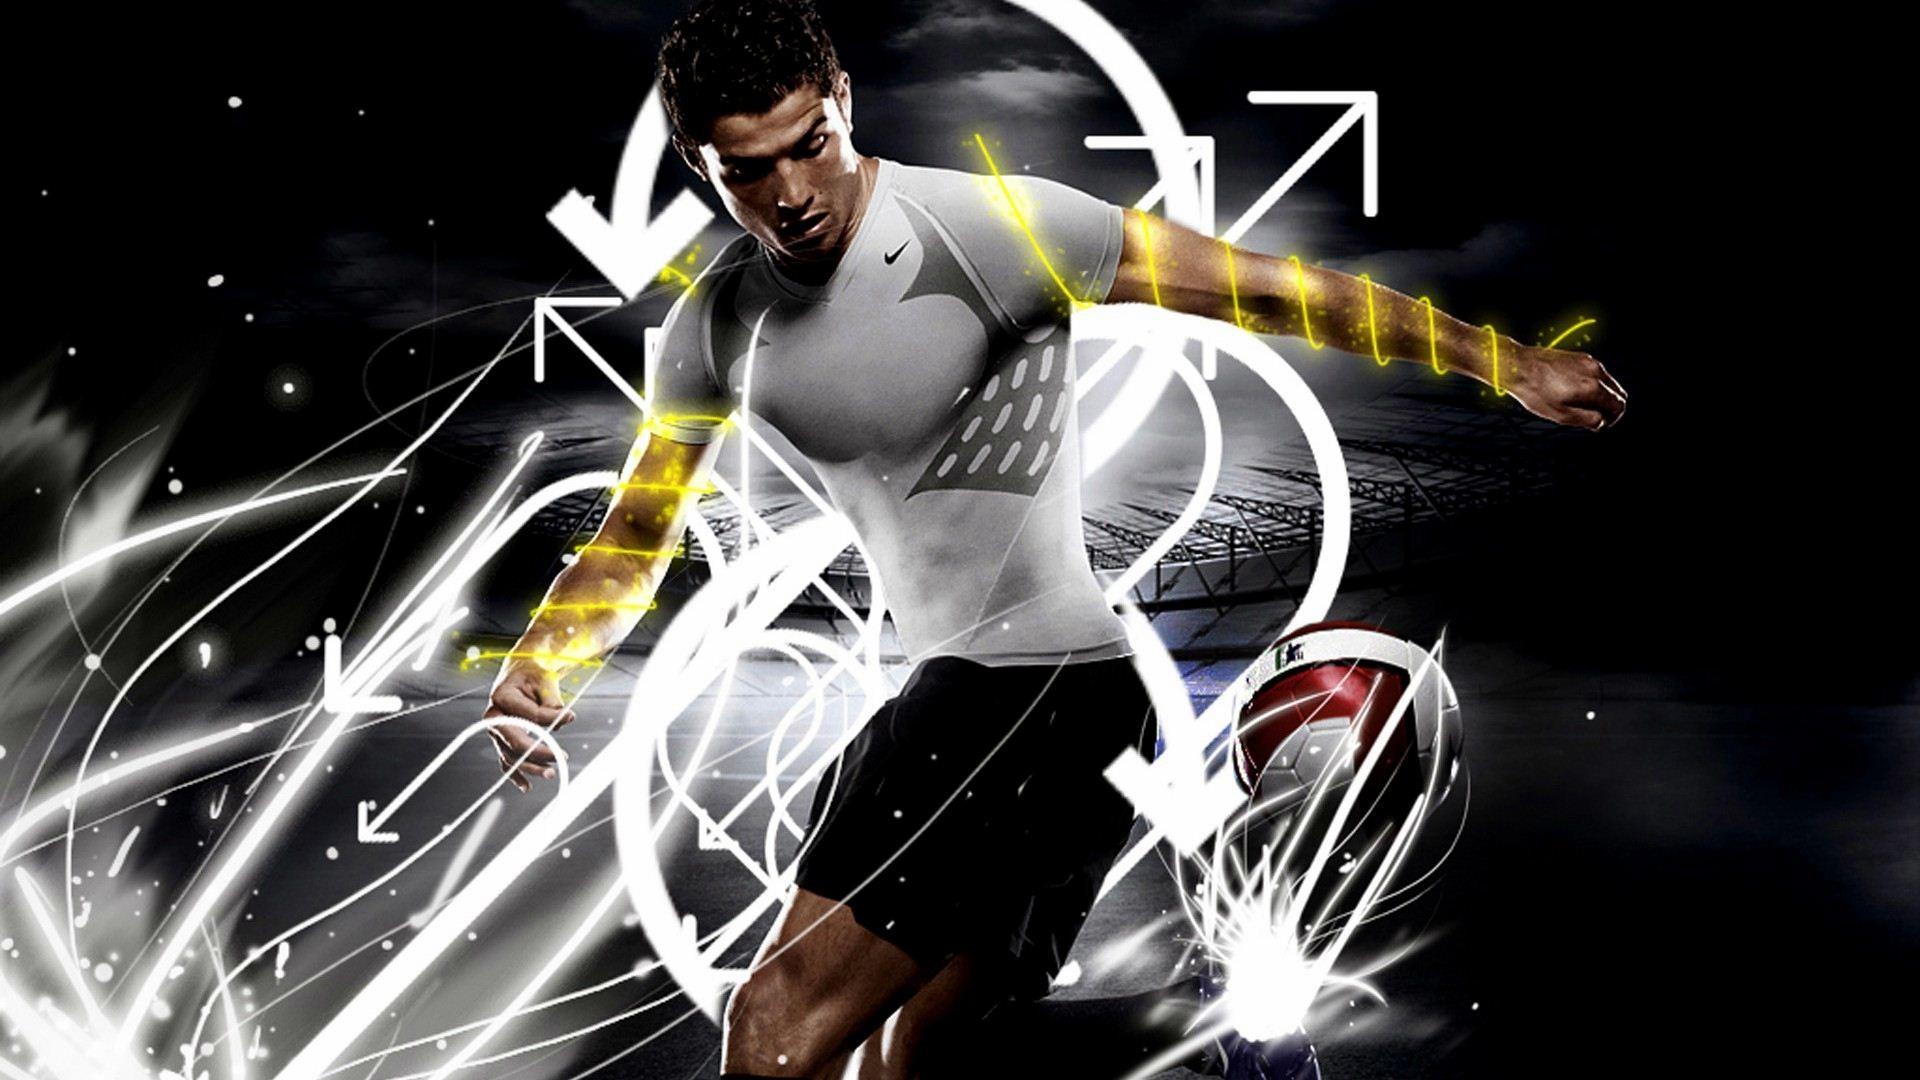 Nike Soccer Wallpaper 2018 ·① WallpaperTag